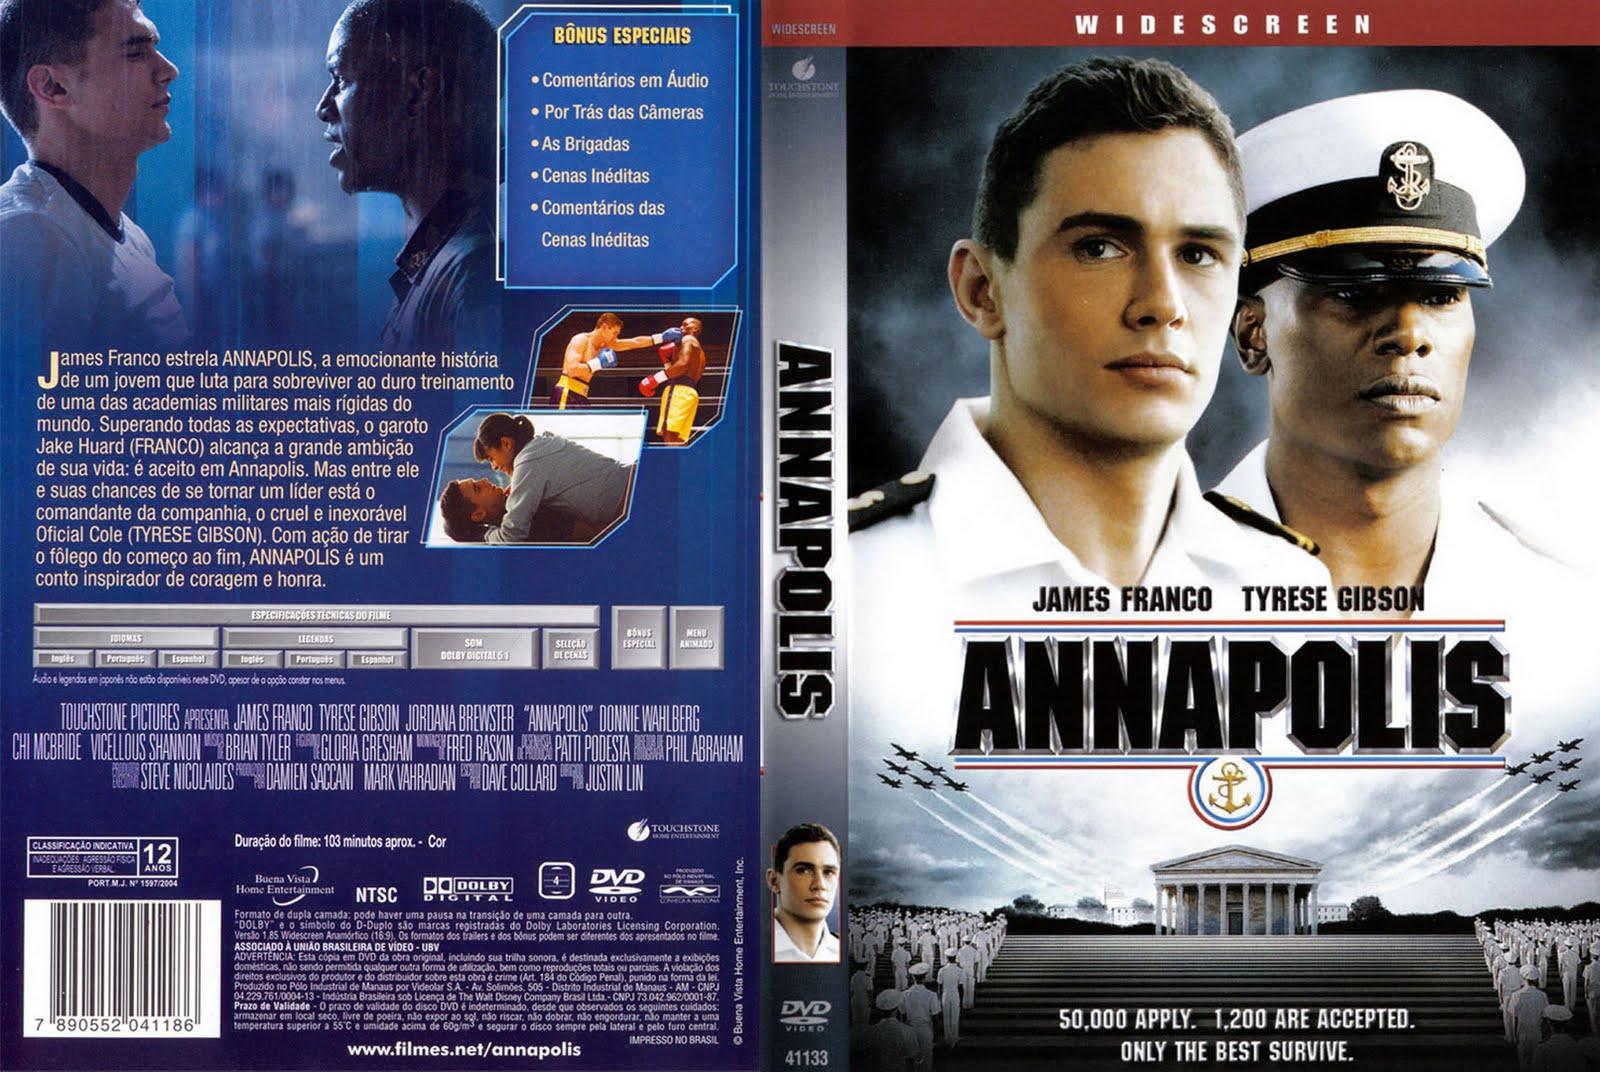 FILME ANNAPOLIS DUBLADO GRATIS BAIXAR